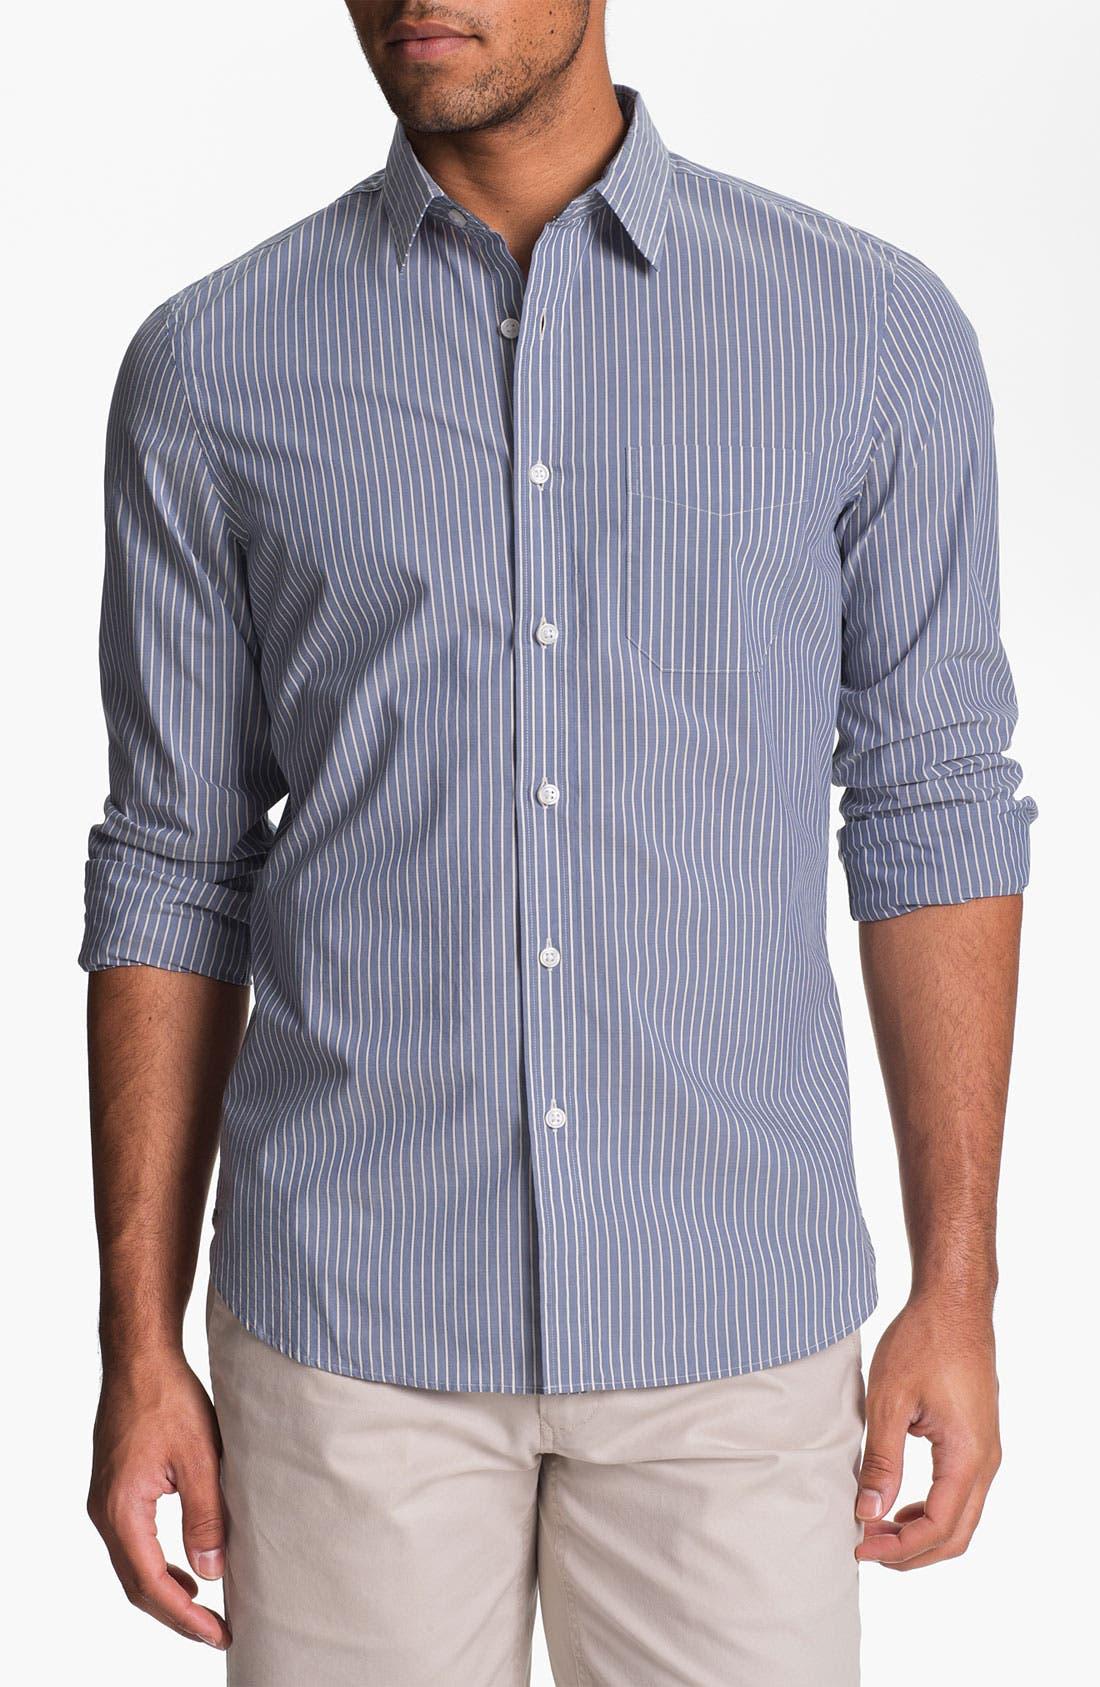 Main Image - Wallin & Bros. Trim Fit Poplin Sport Shirt